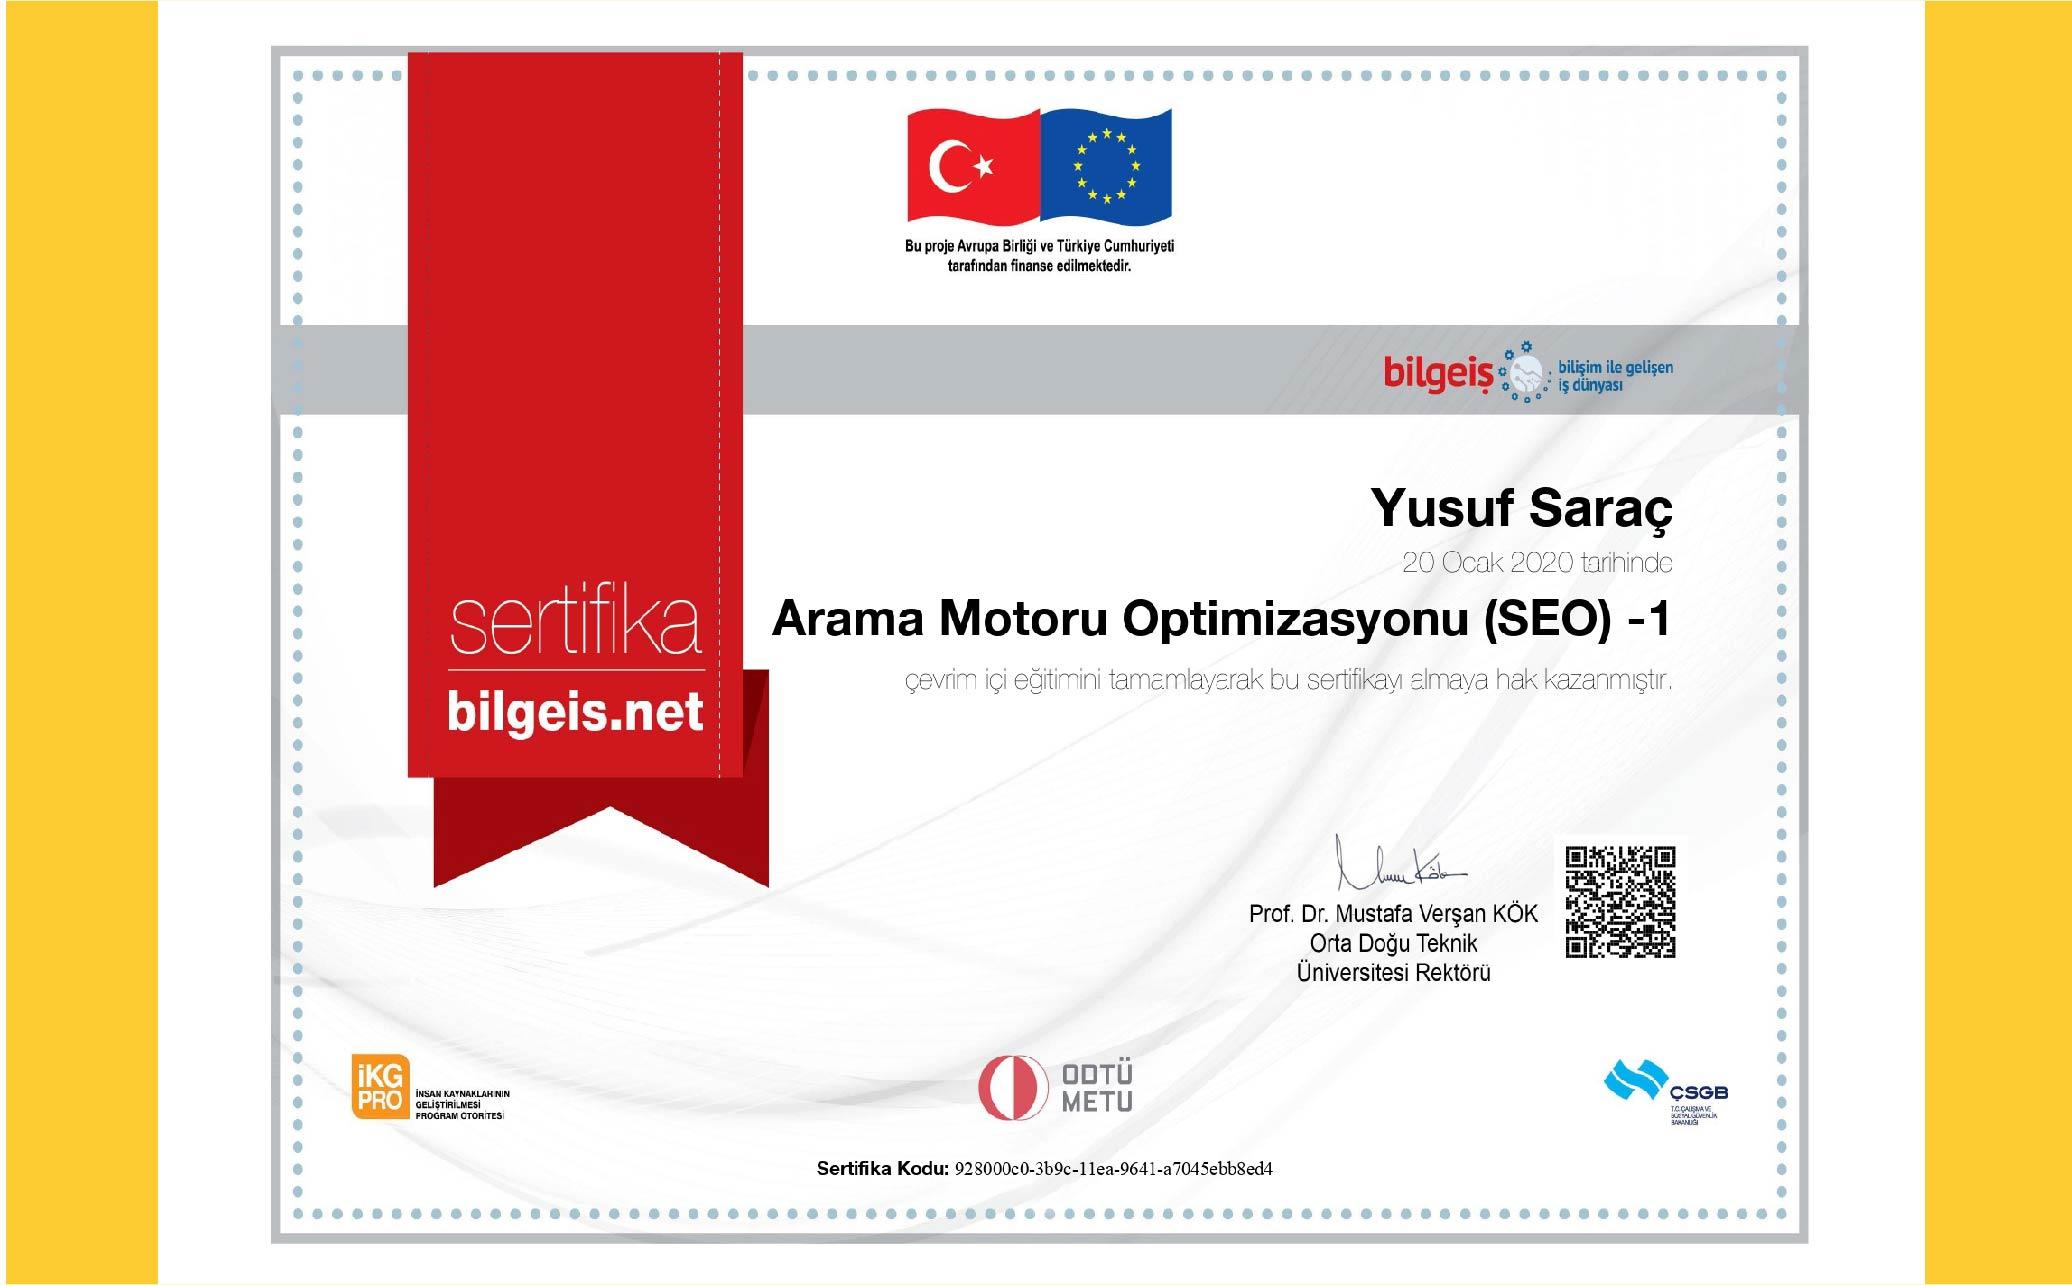 Yusuf Saraç | ODTÜ SEO Optimizasyonu Sertifika 1